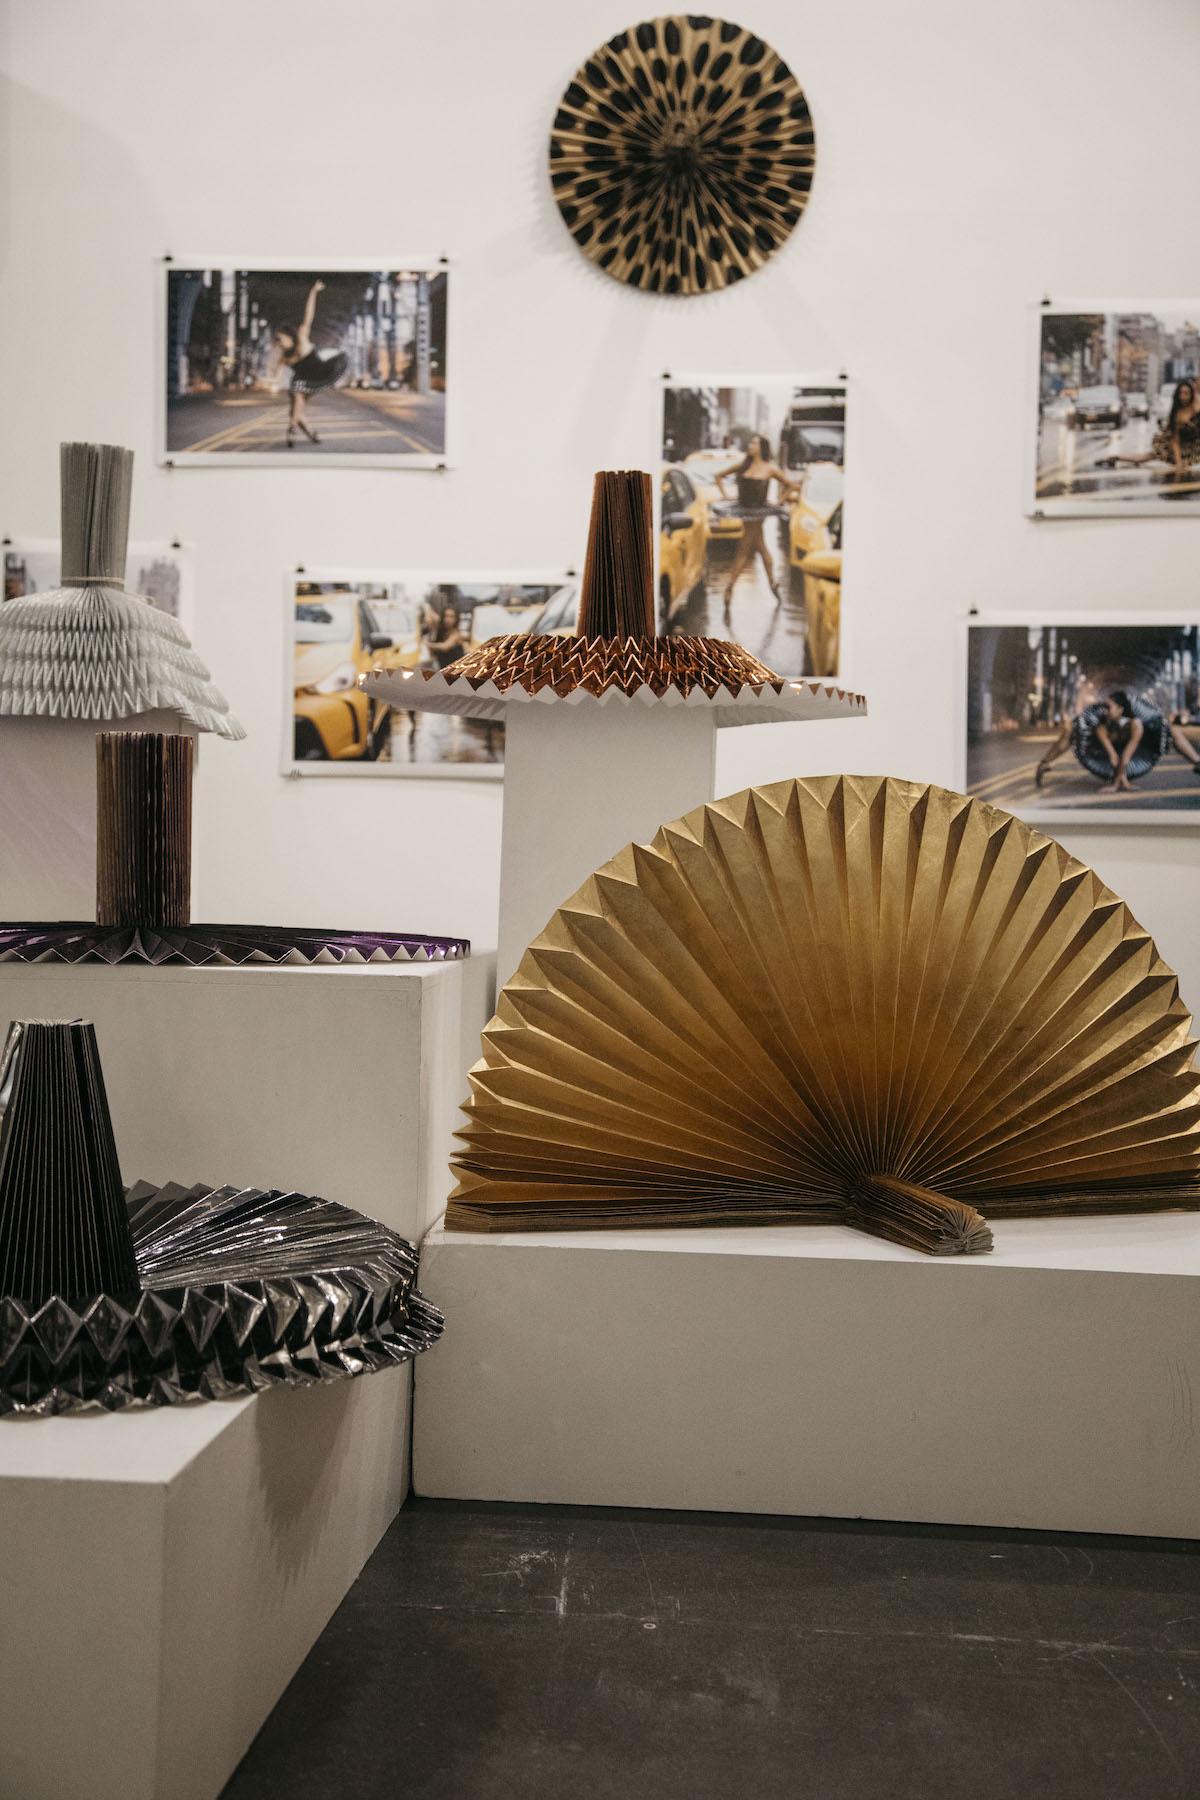 miss-cloudy-pauline-loctin-plie-project-melika-dez-ausgang-exhibition-paper-art-origami-ballerina-ballet-dancer-pointe-fold-4.JPG